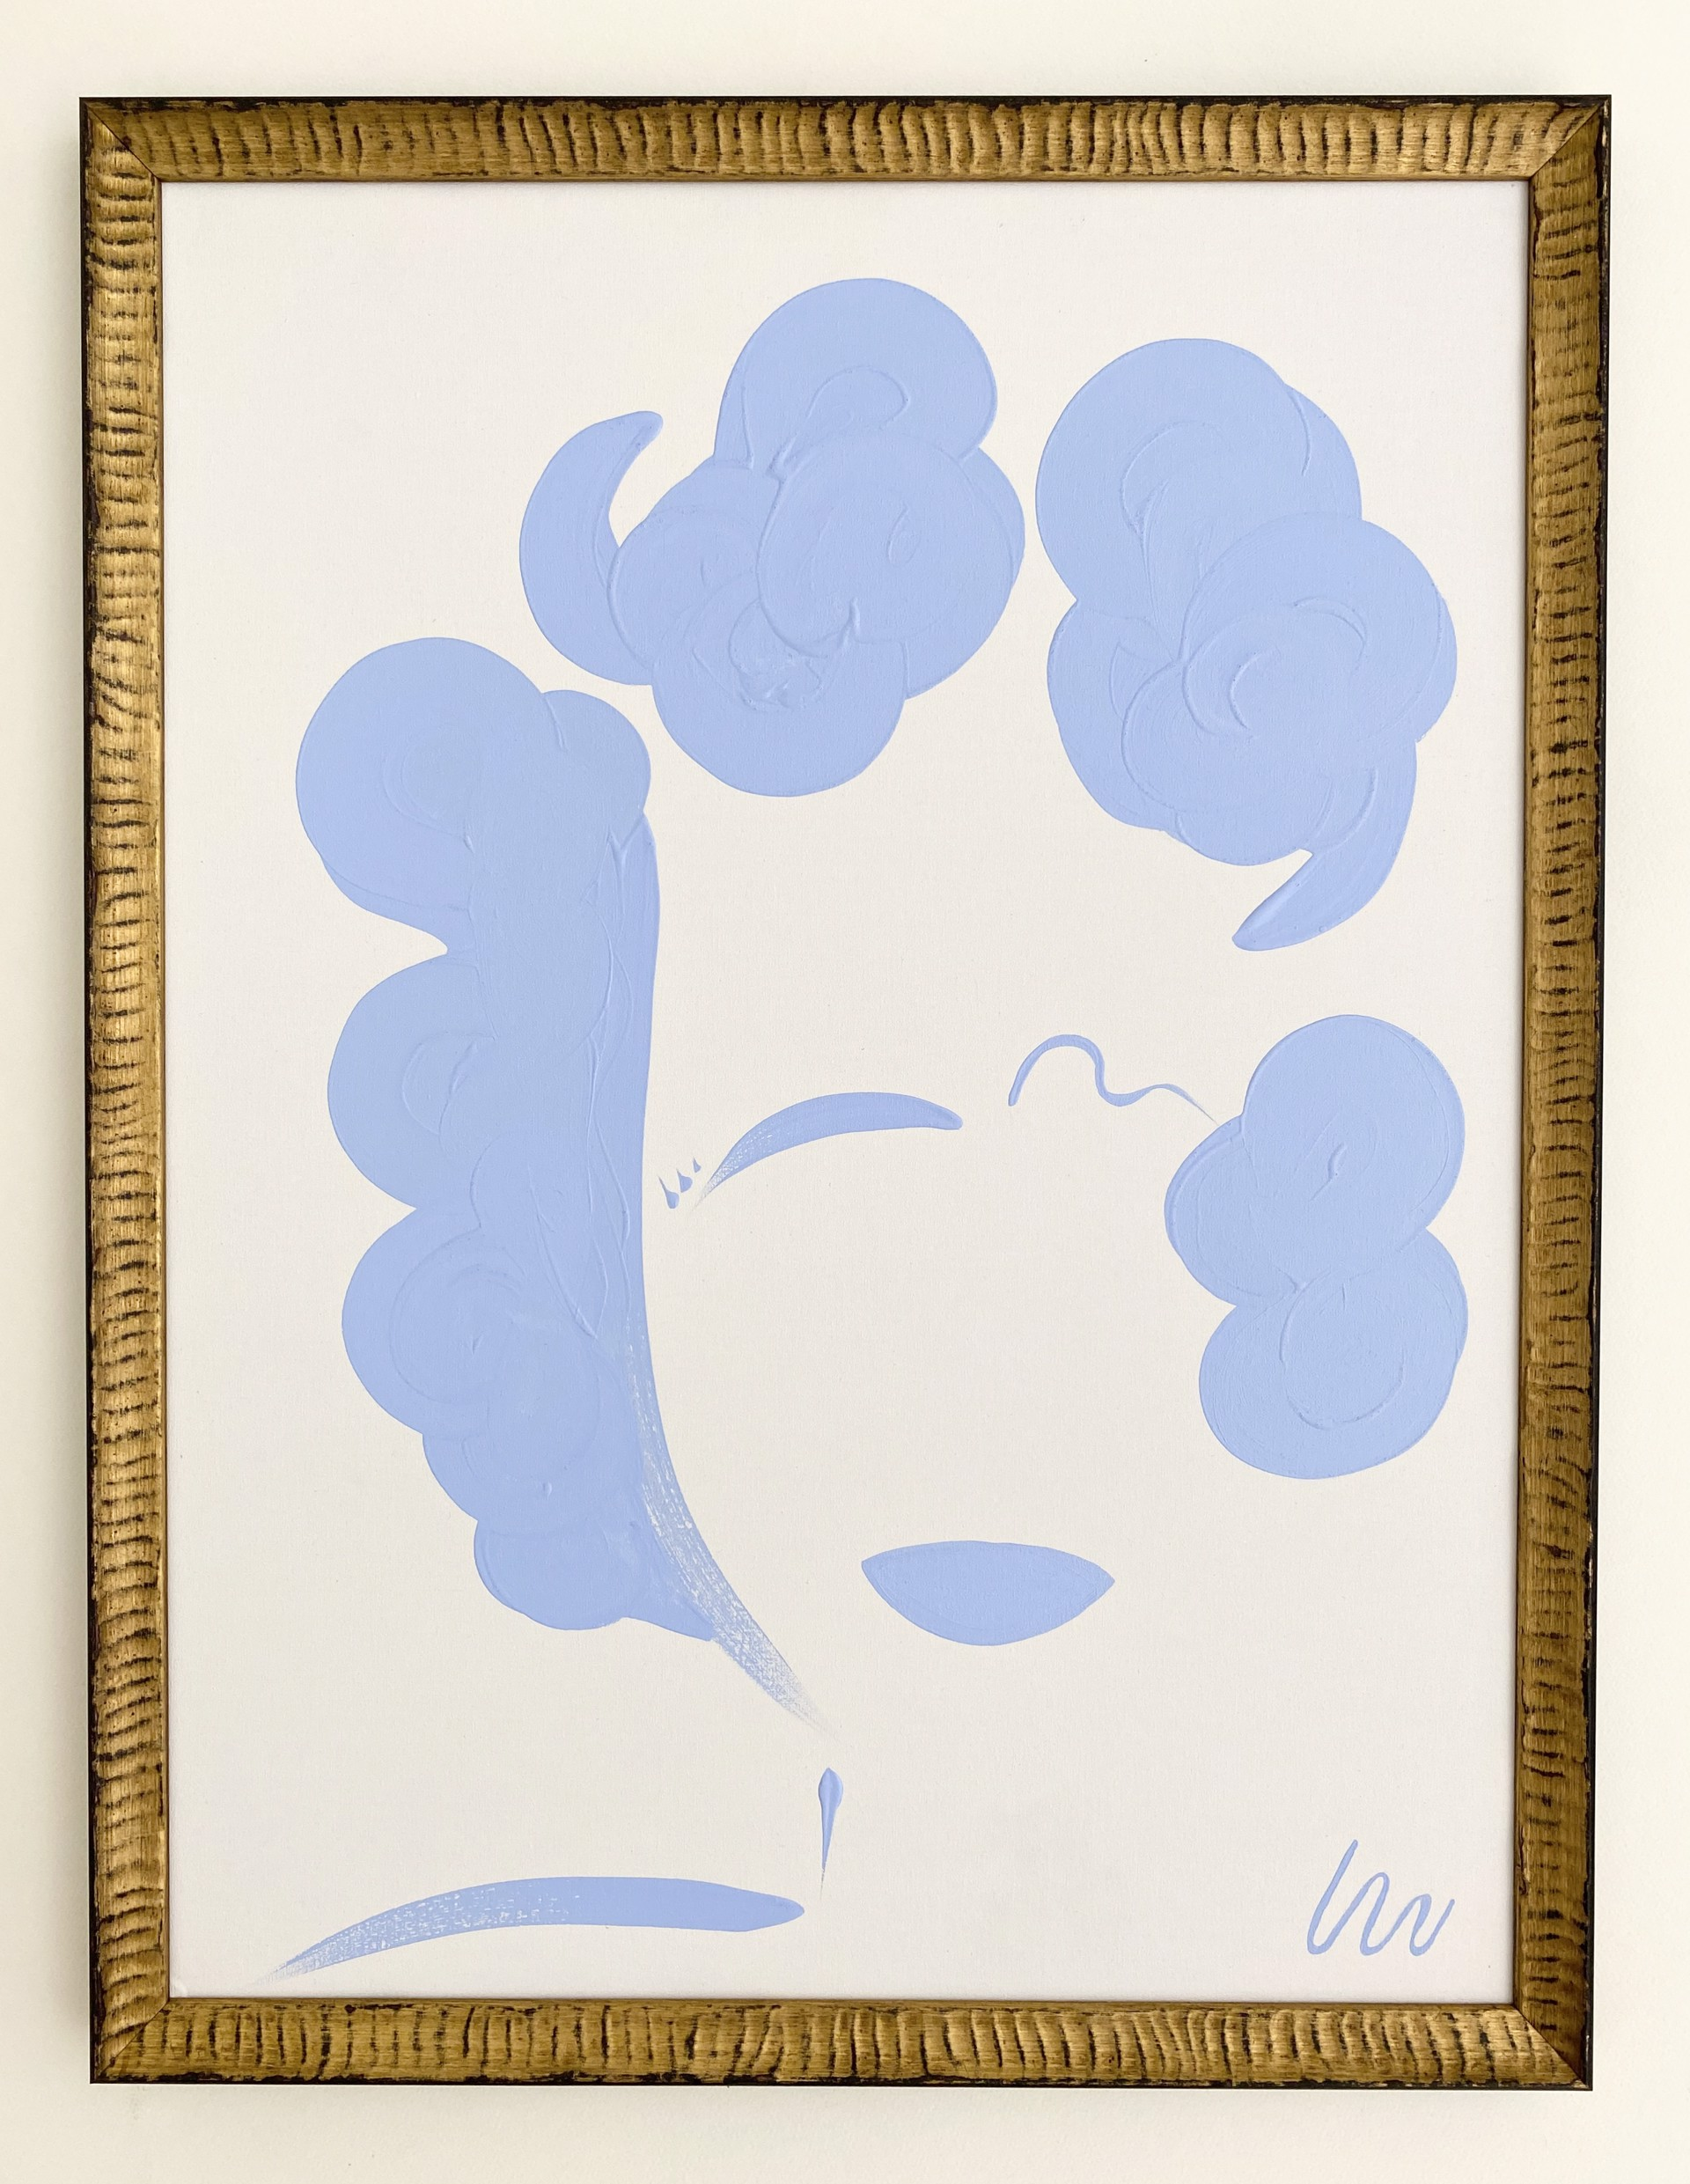 Azure Blue Lady, I by Whitney Stoddard